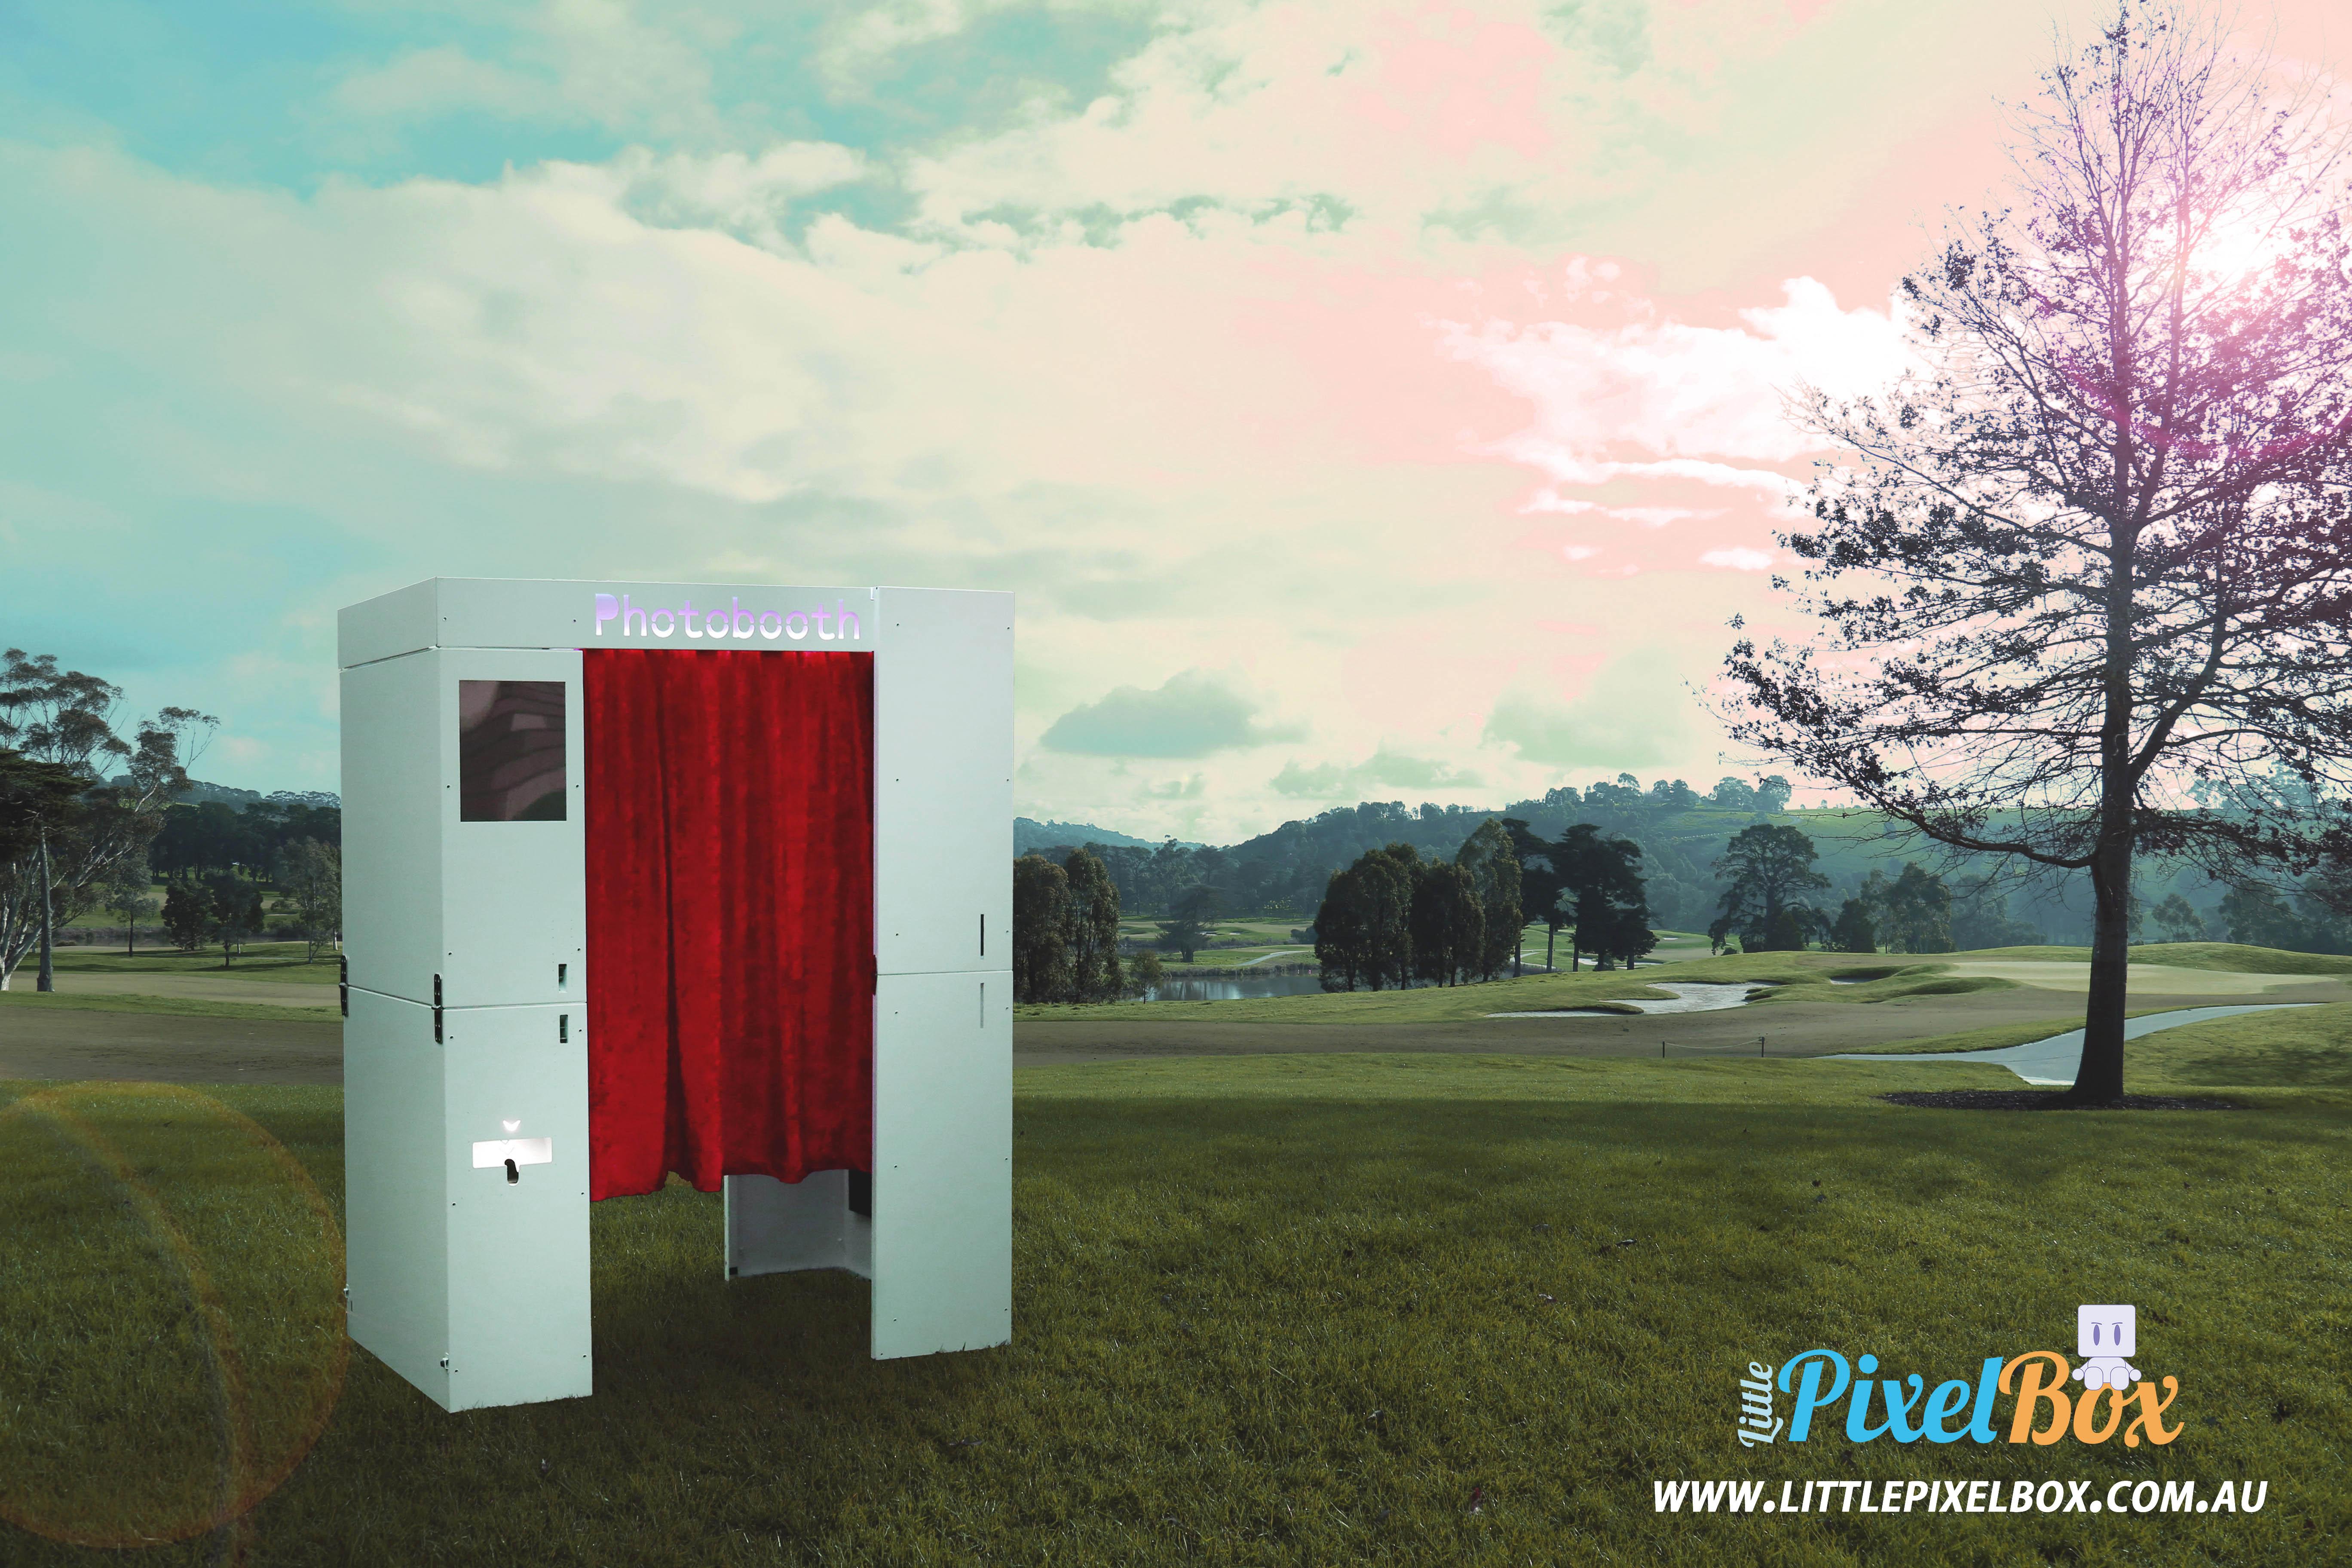 Littlepixelbox photobooth